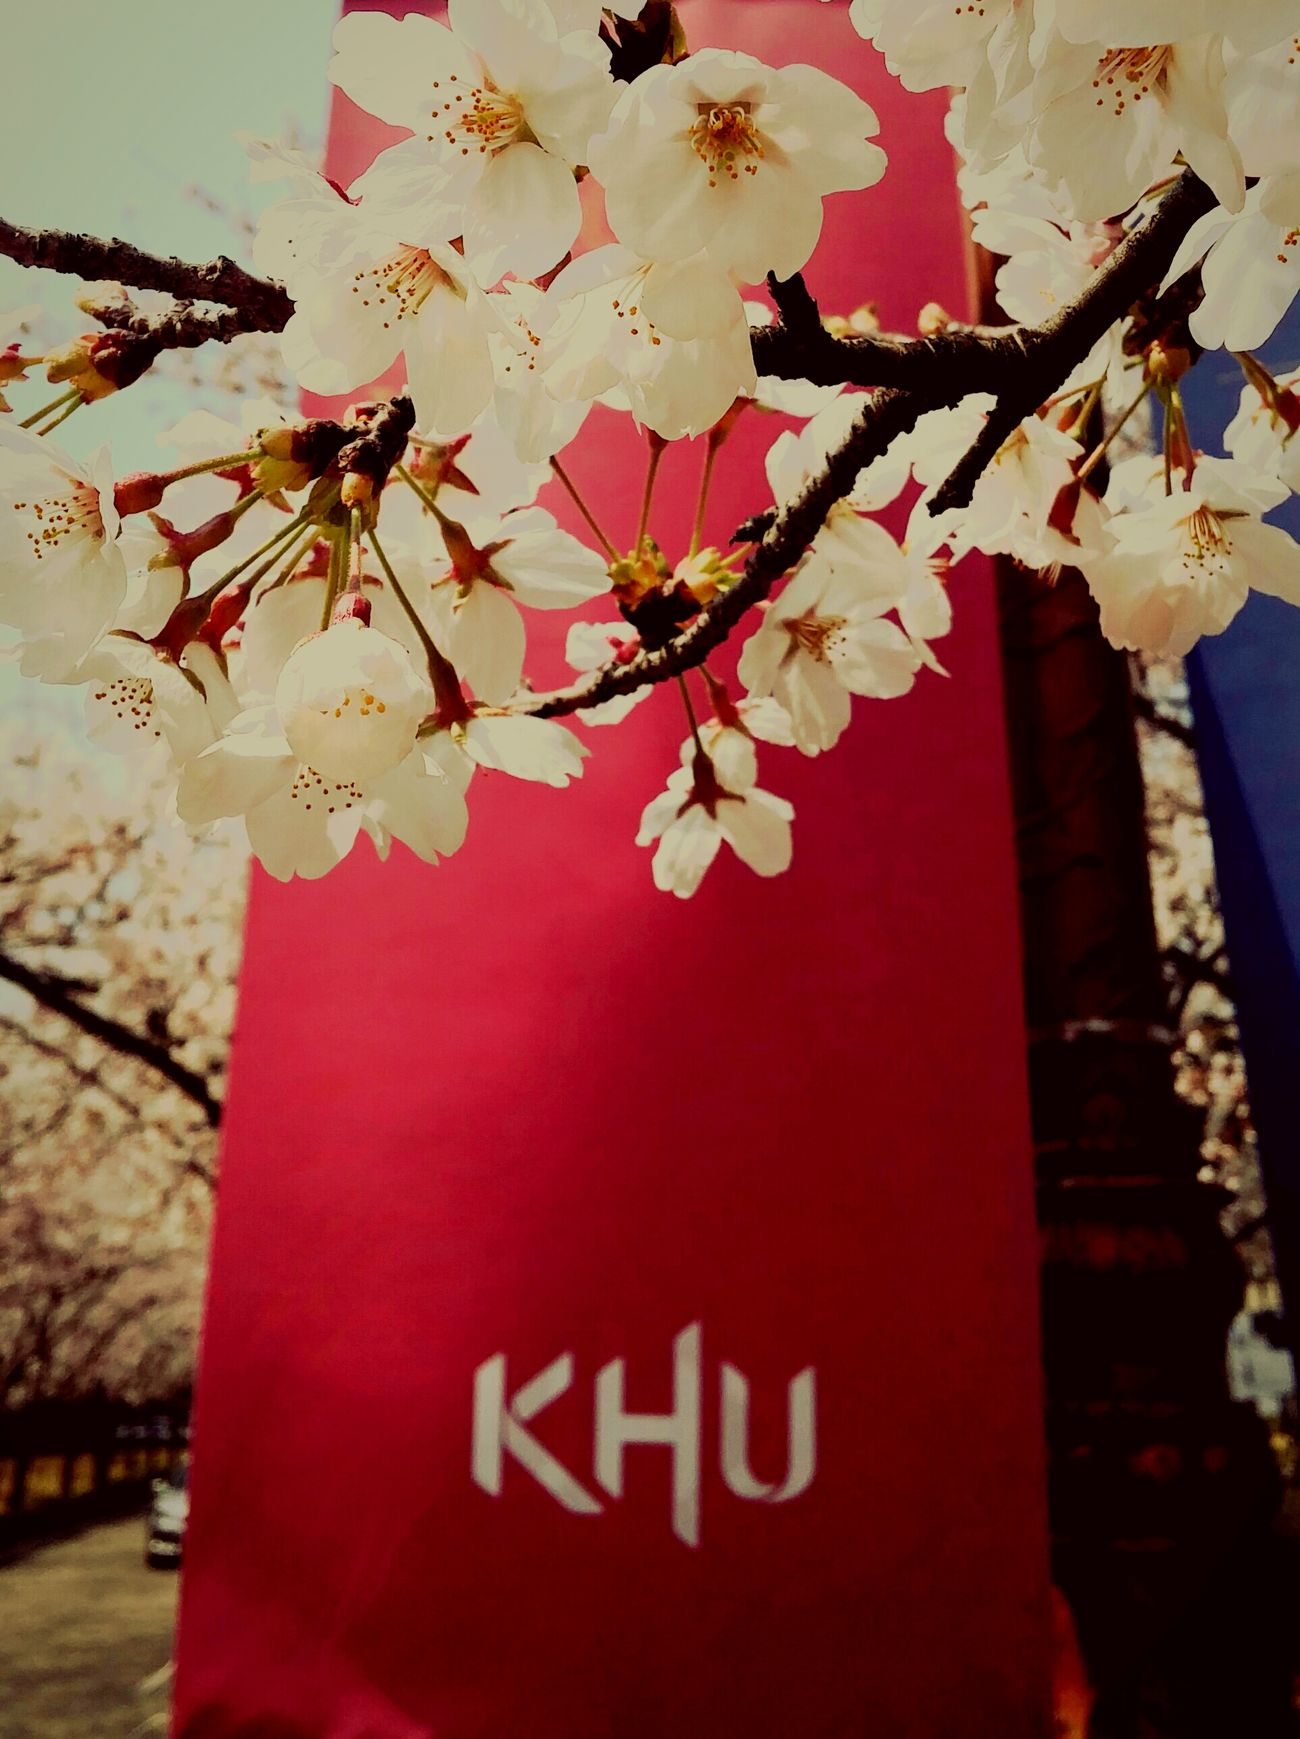 University University Campus Kyunghee Spring Spring Flowers